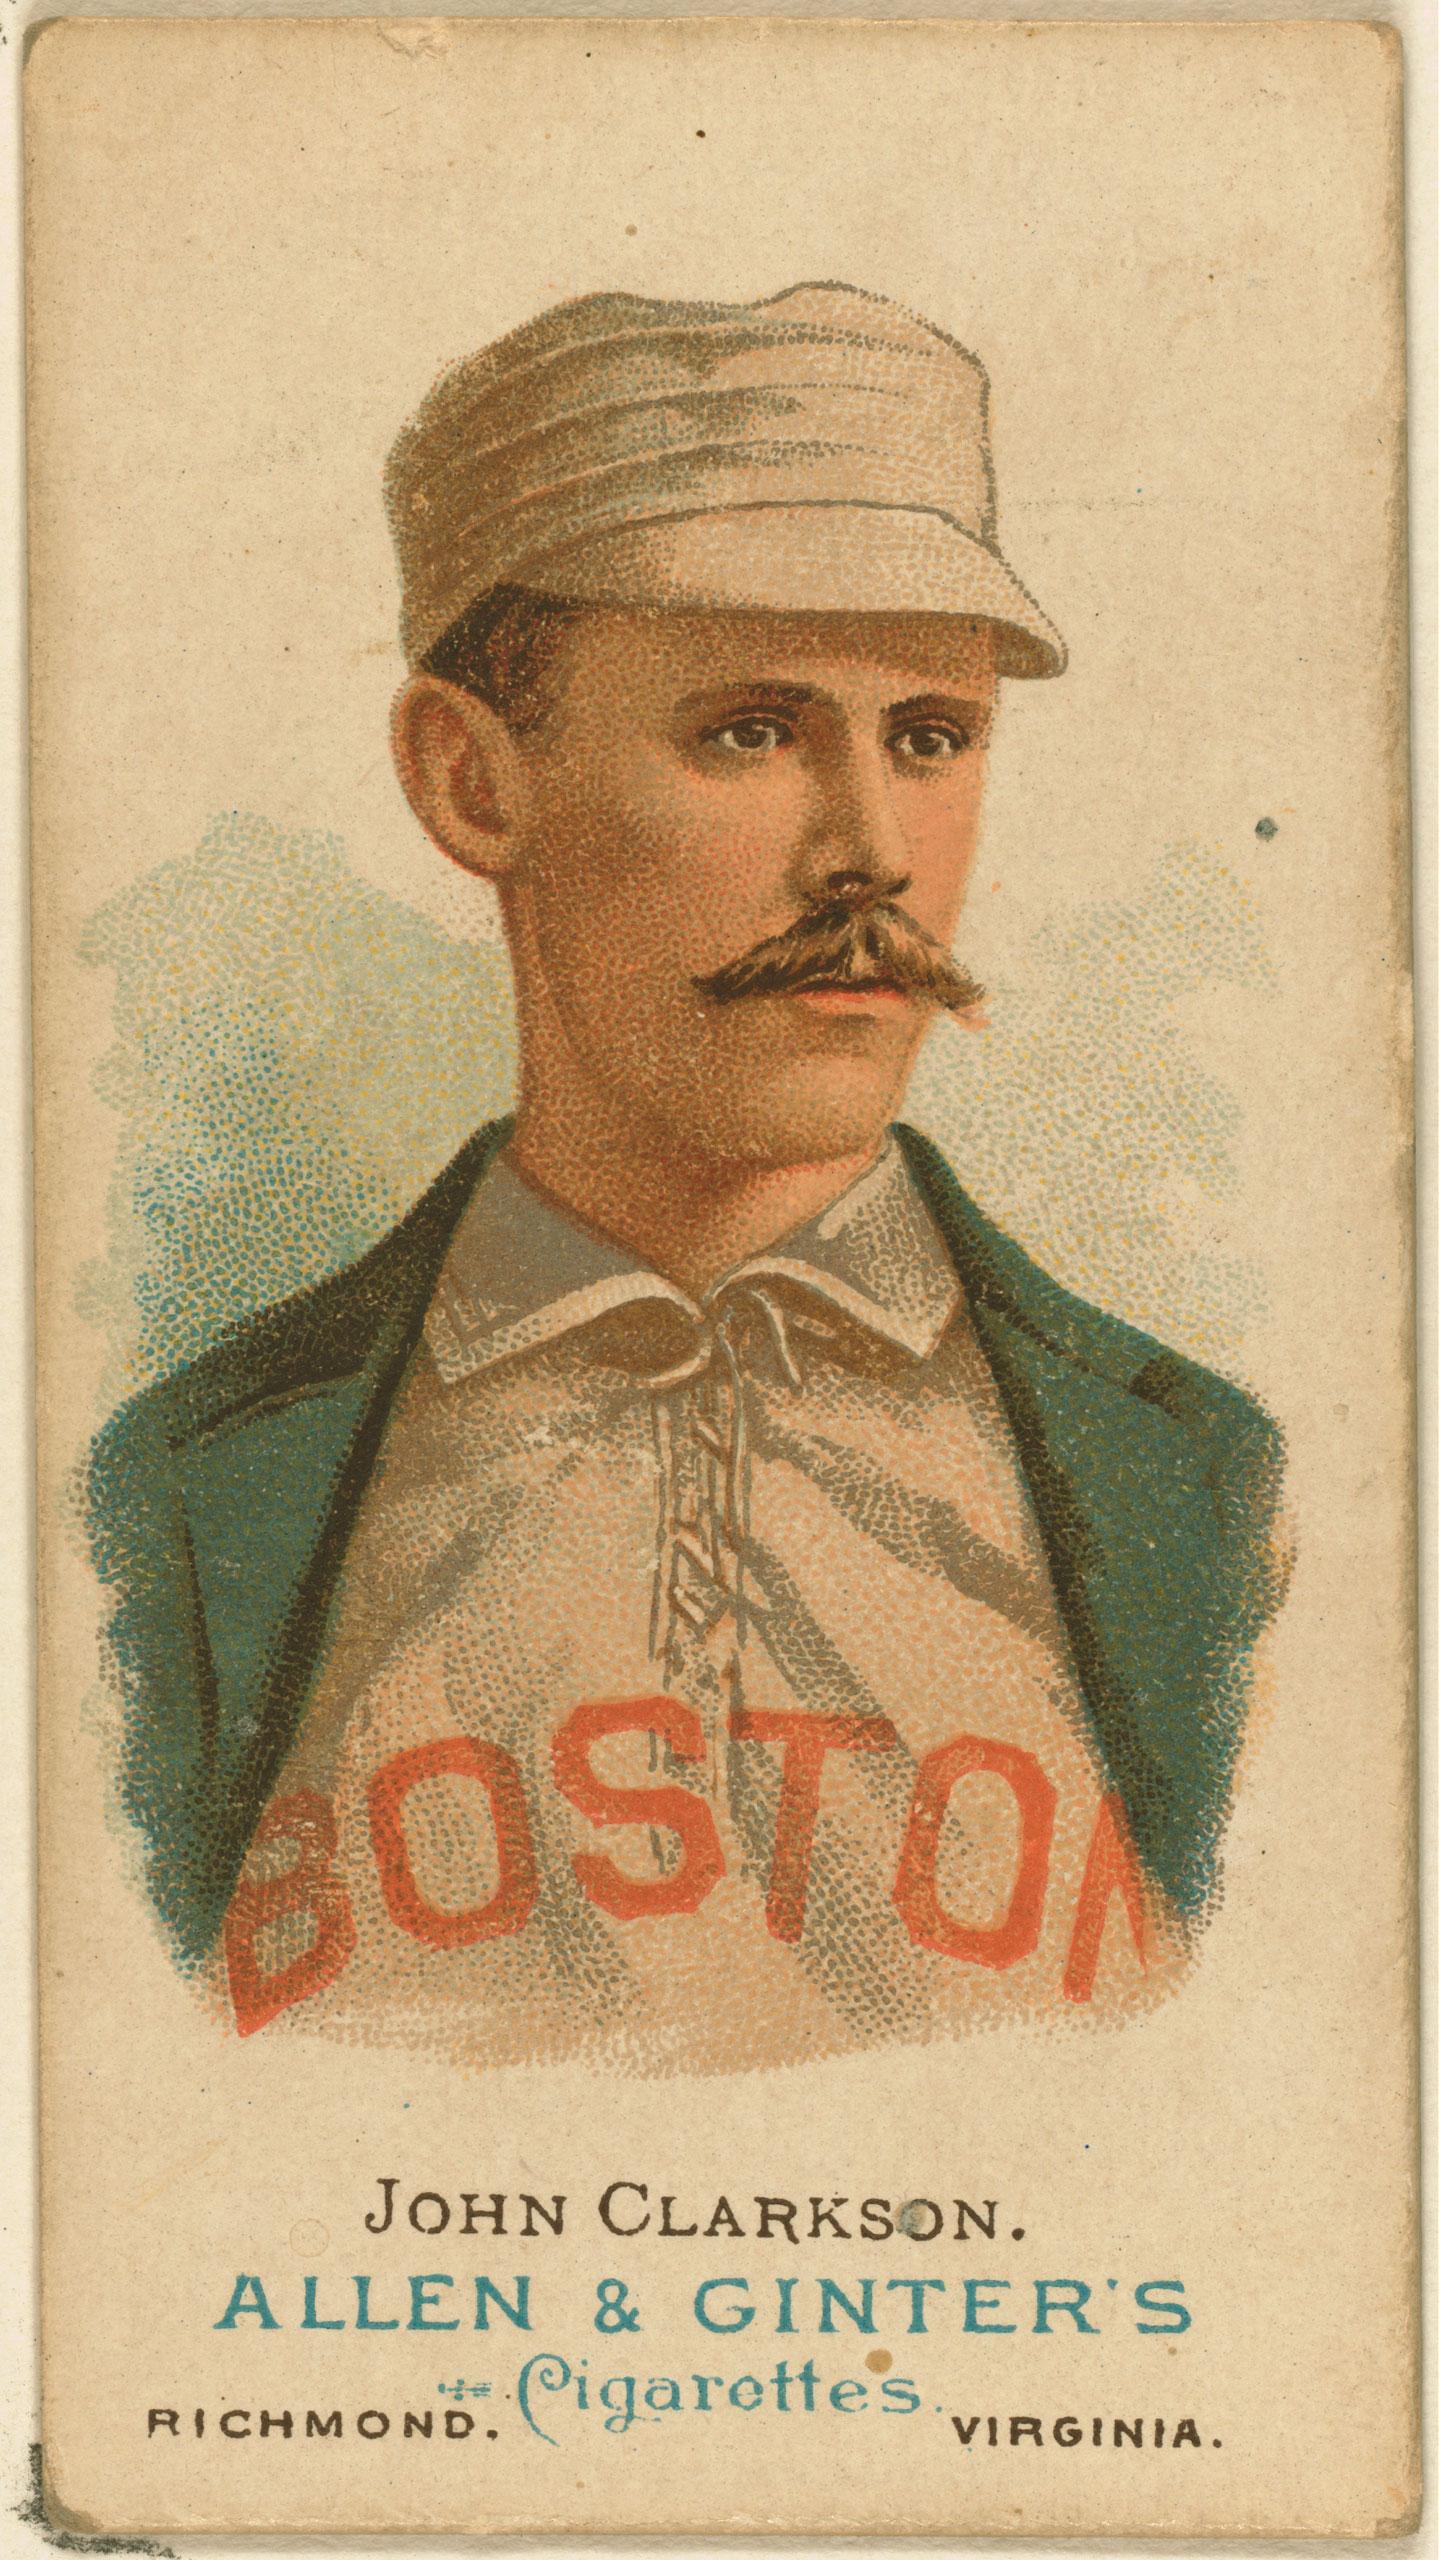 John Clarkson, Boston Beaneaters, baseball card, 1887.